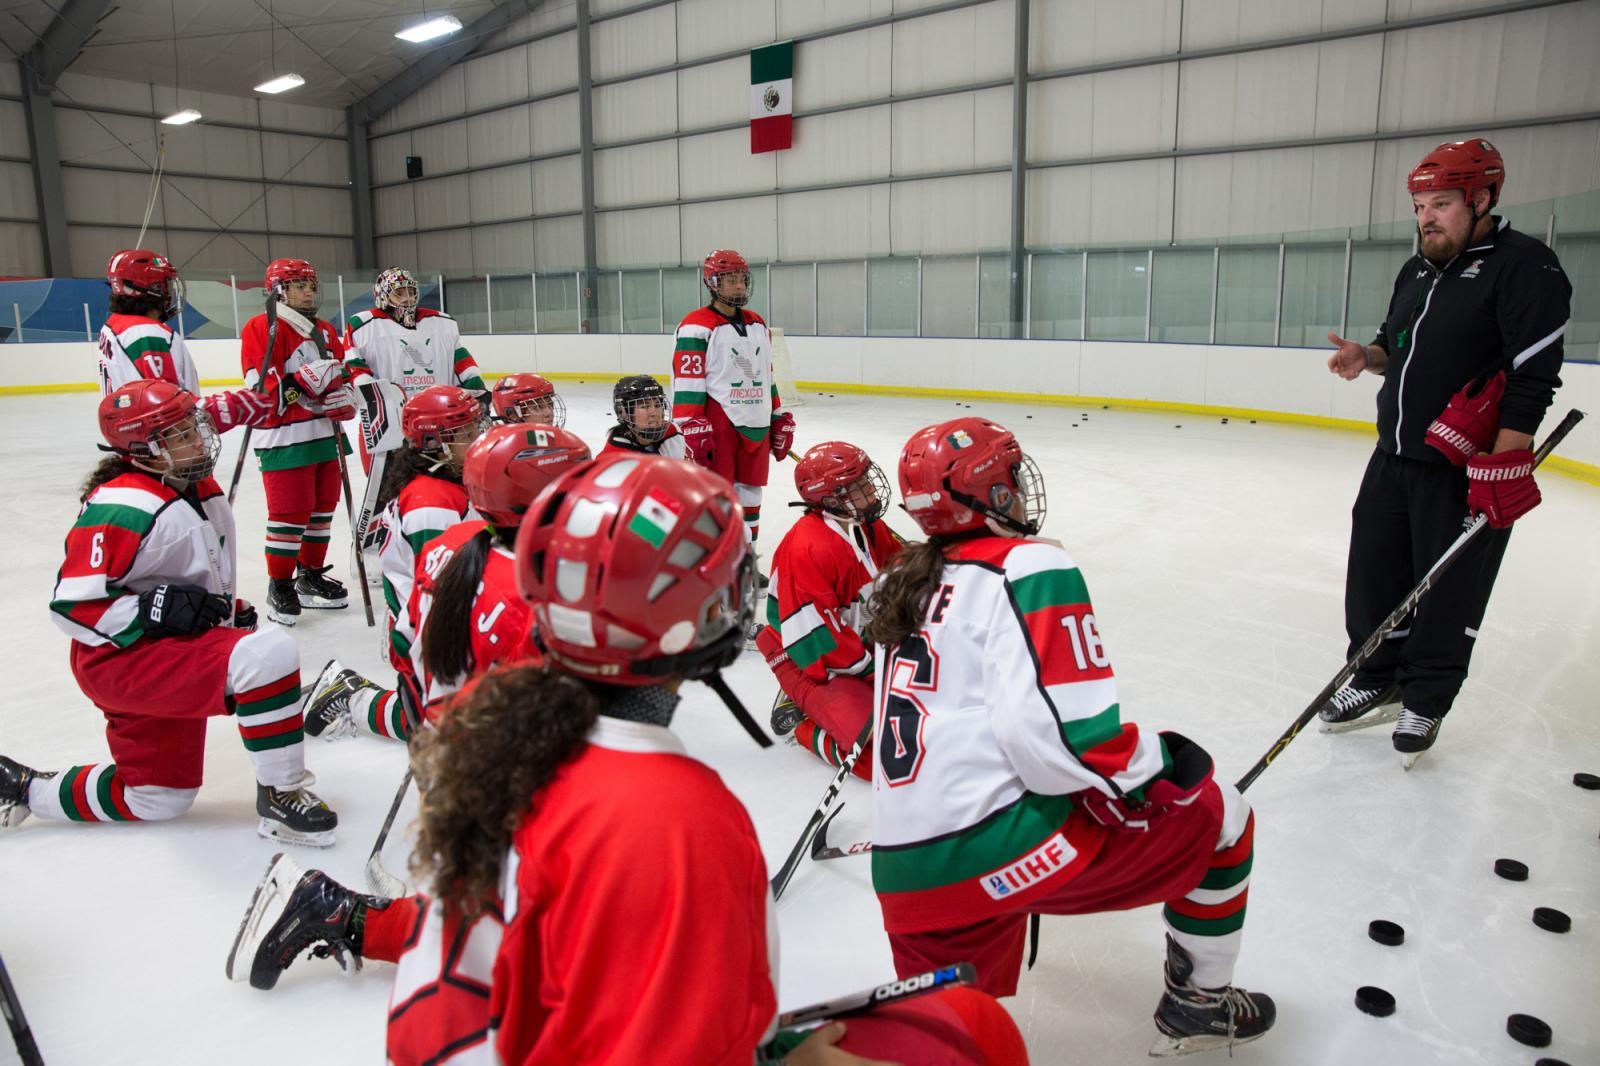 Photography image - Loading WomenIceHockey04.jpg